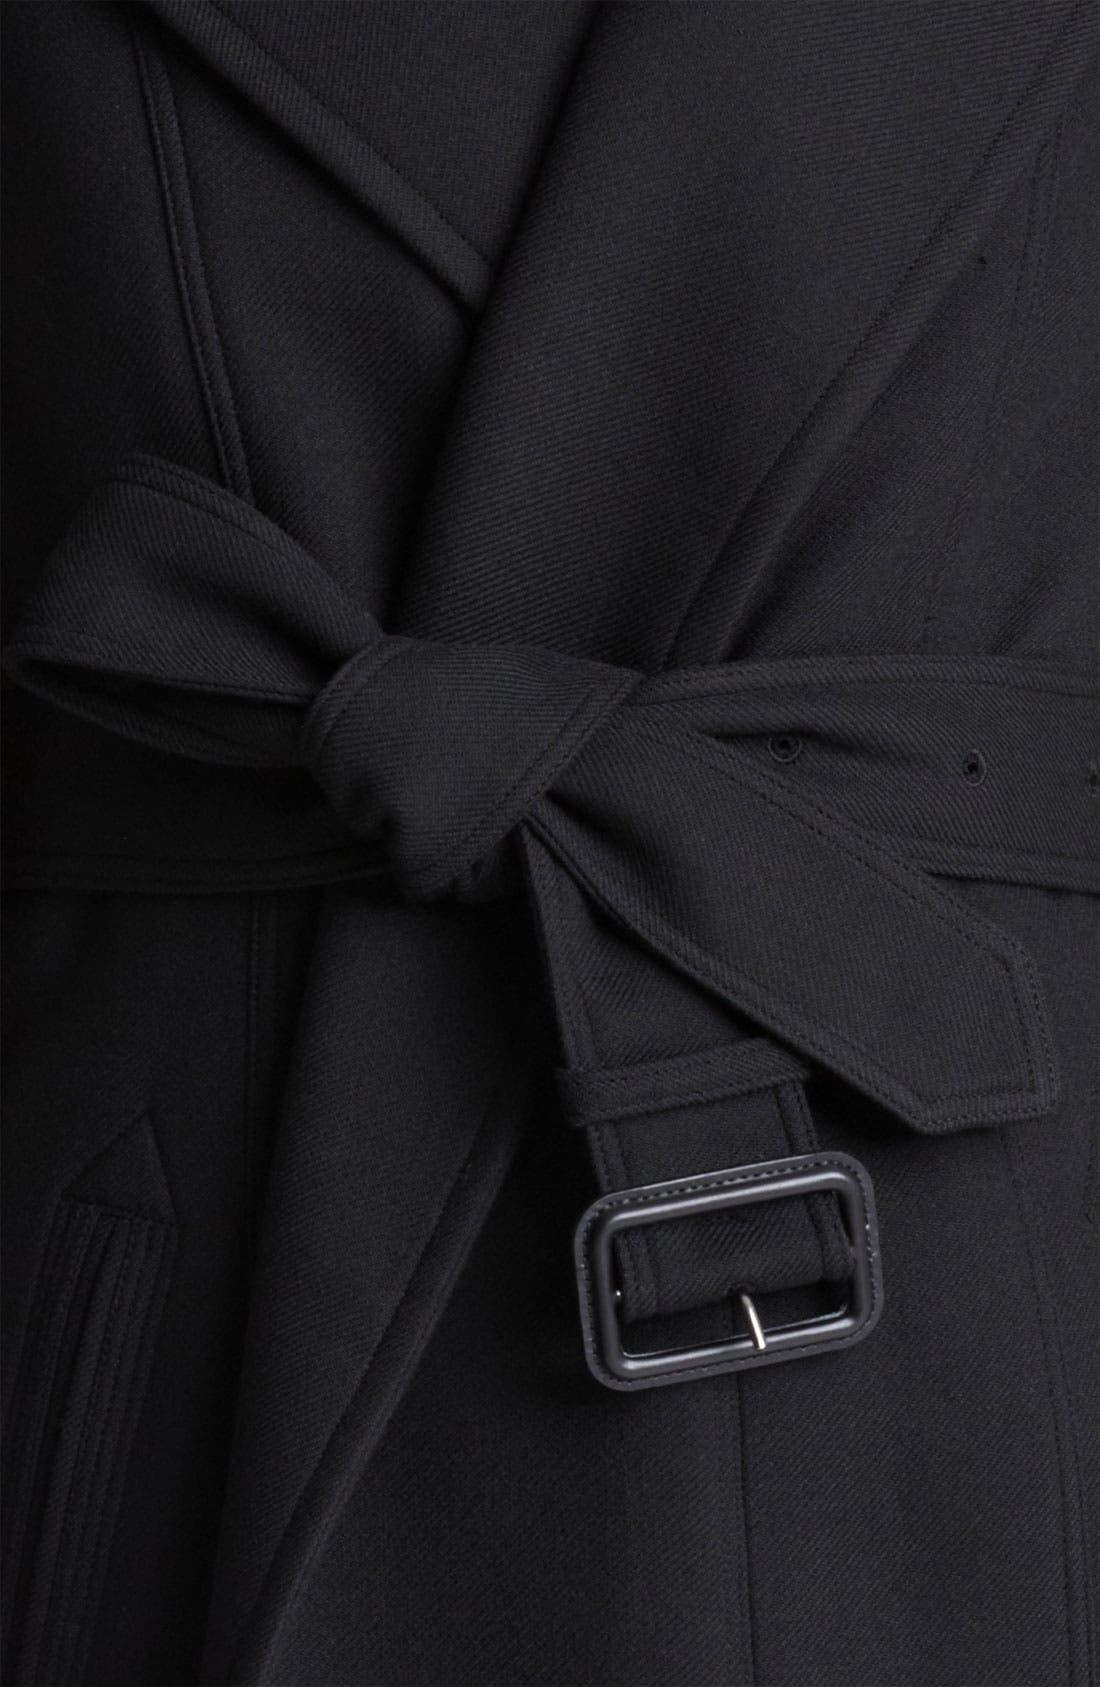 Blanket Wrap Military Jacket,                             Alternate thumbnail 2, color,                             001